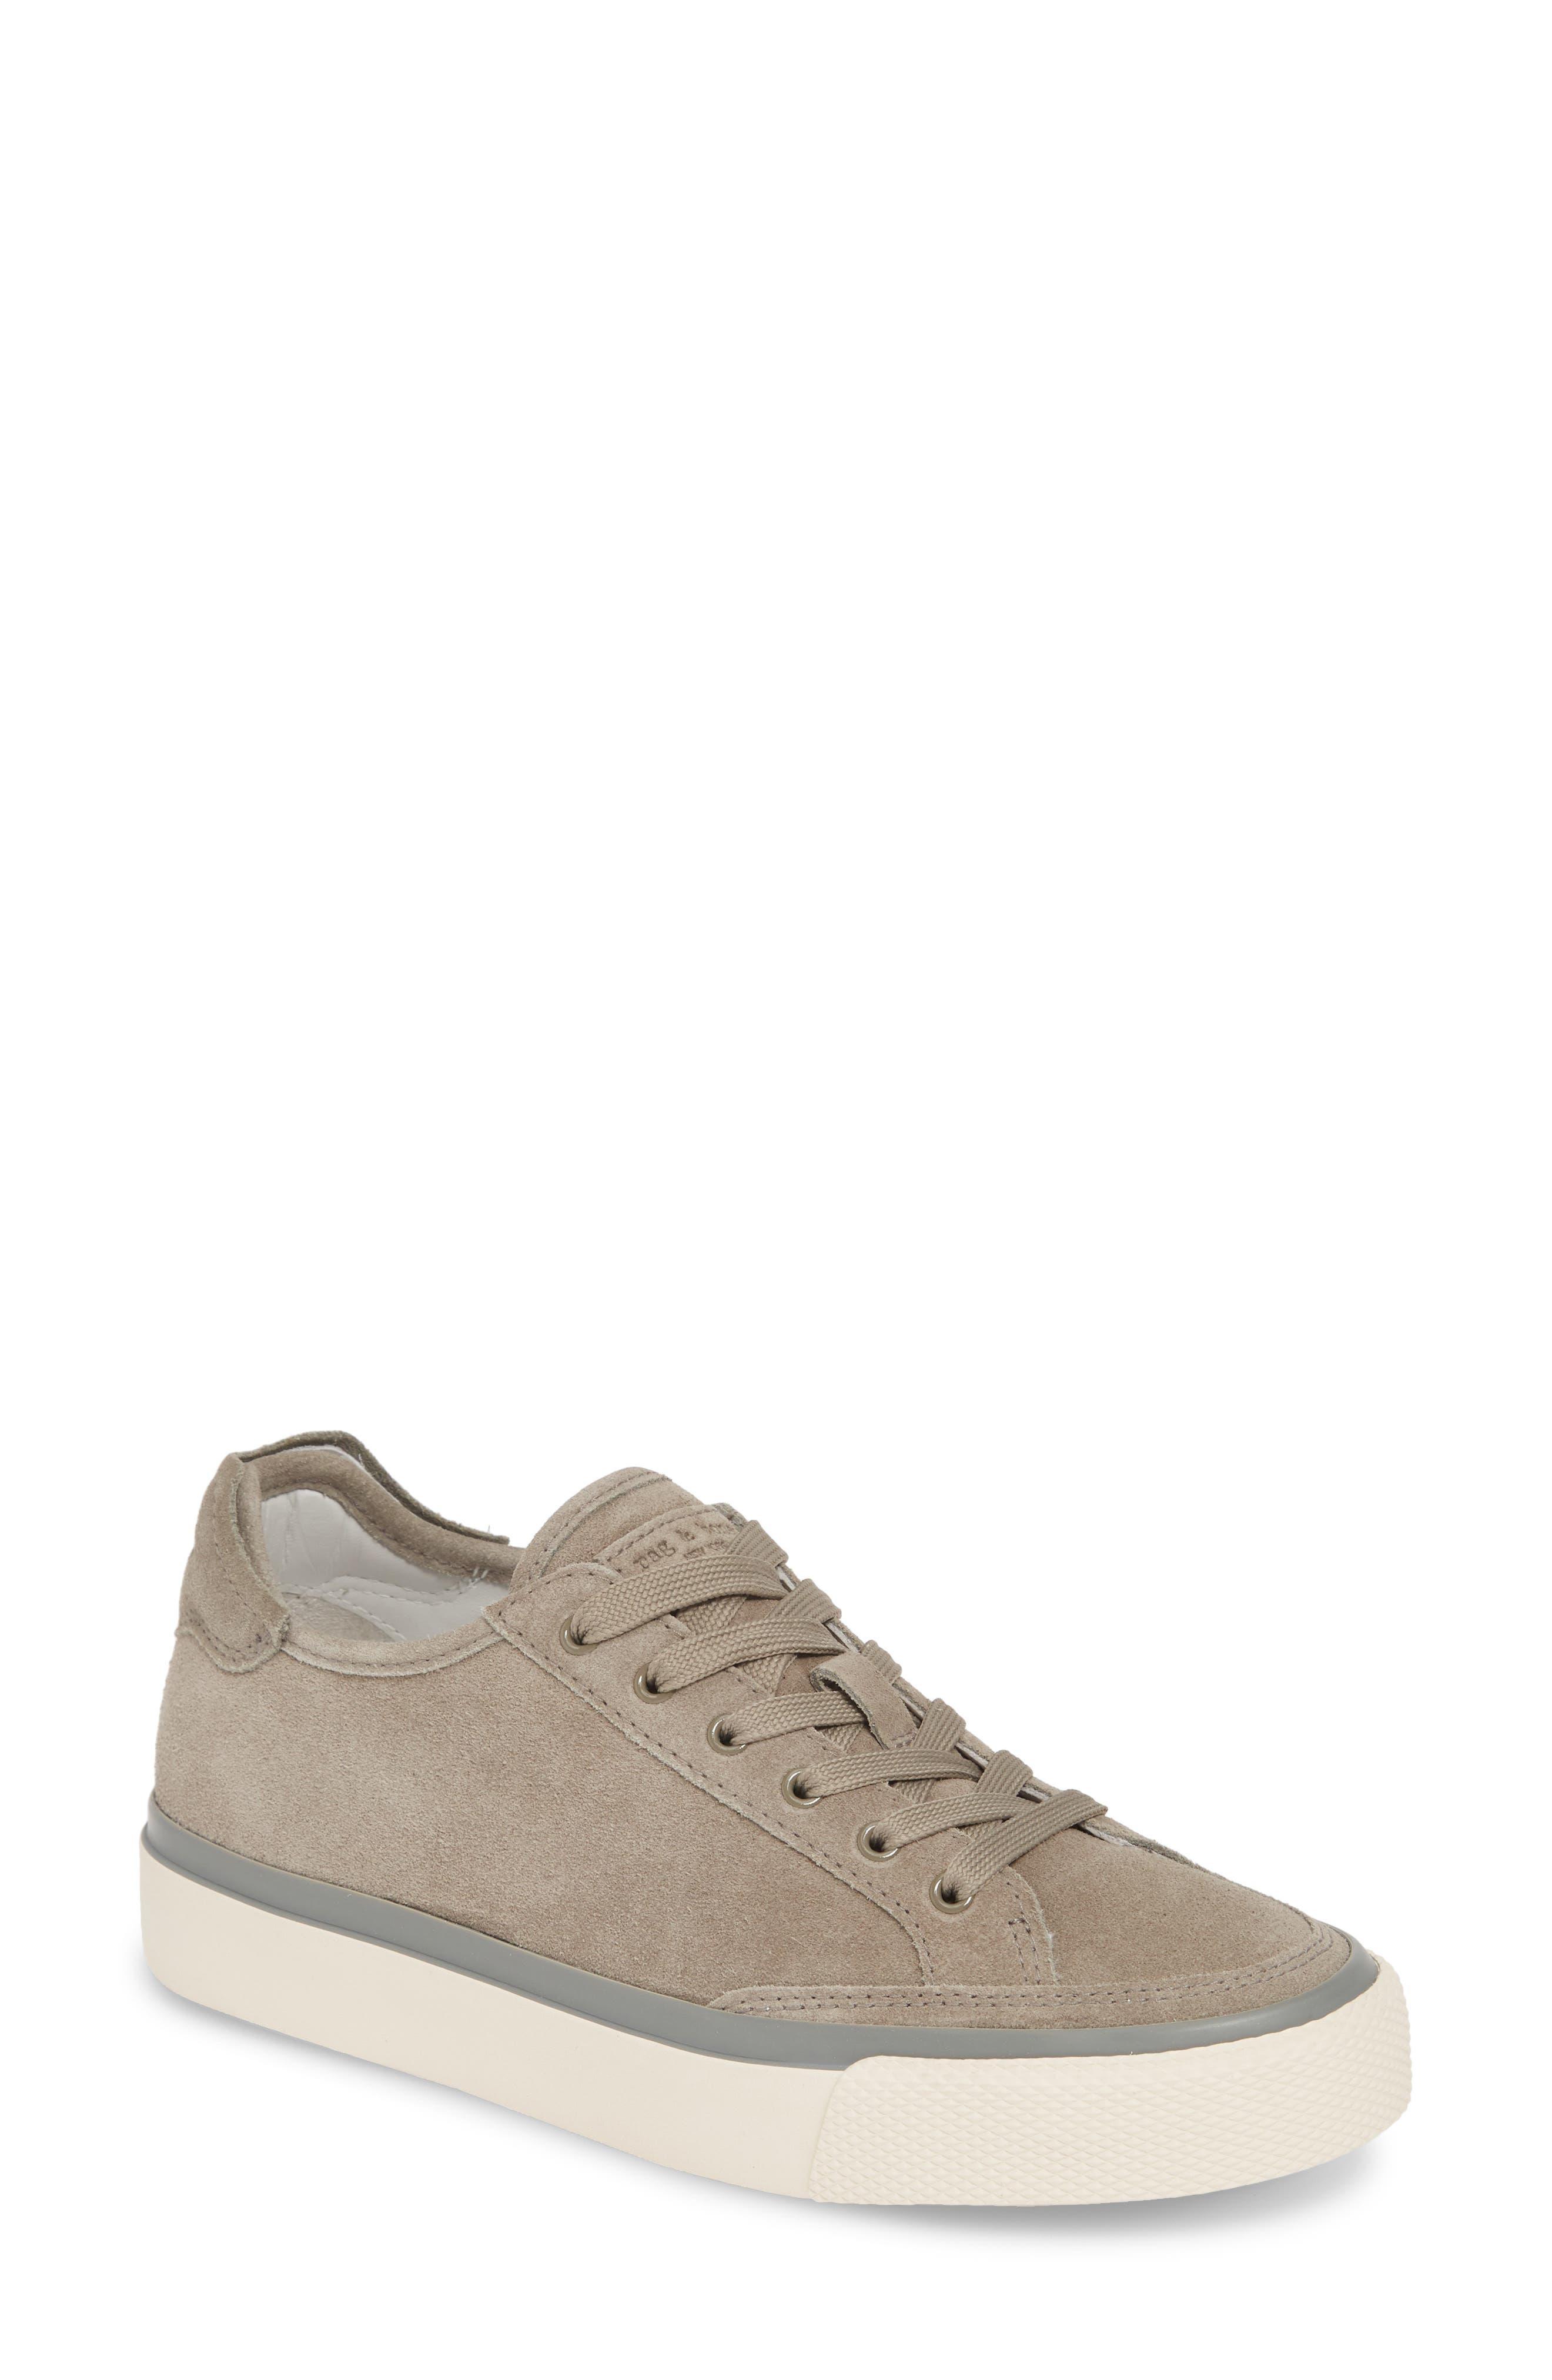 Rag & Bone Army Low Top Sneaker, Grey